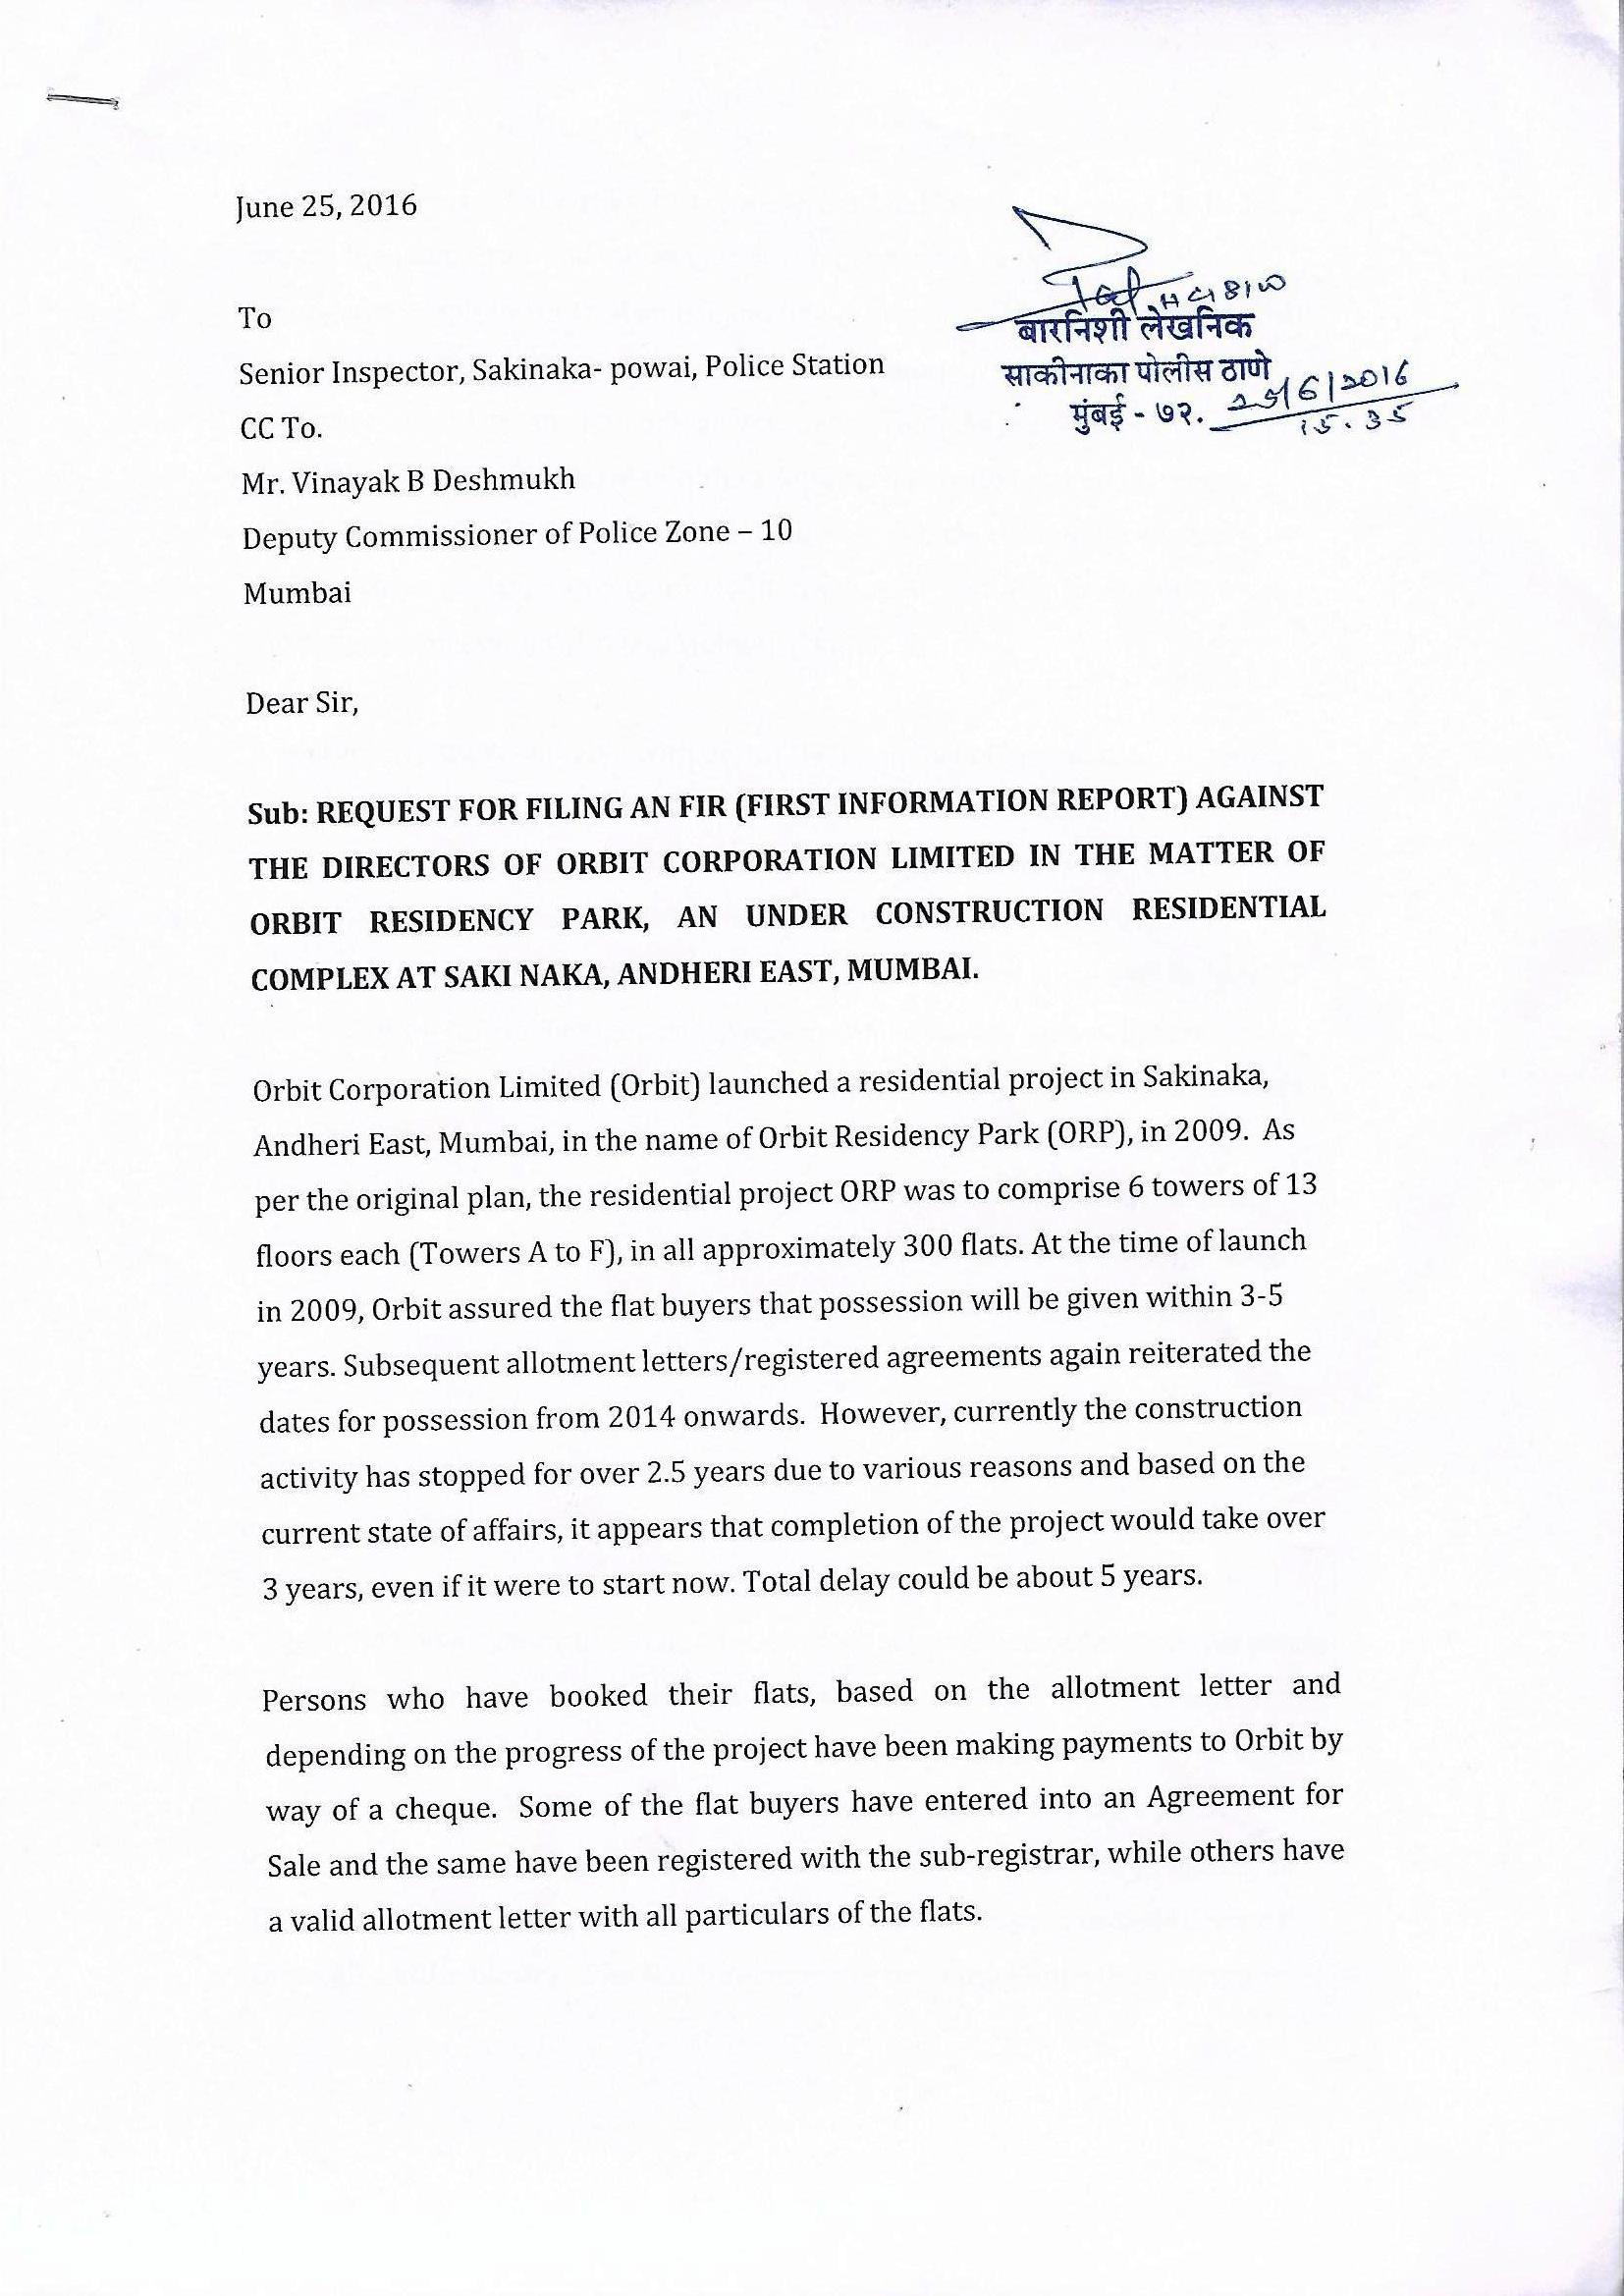 Orbit Residency Park Complaint